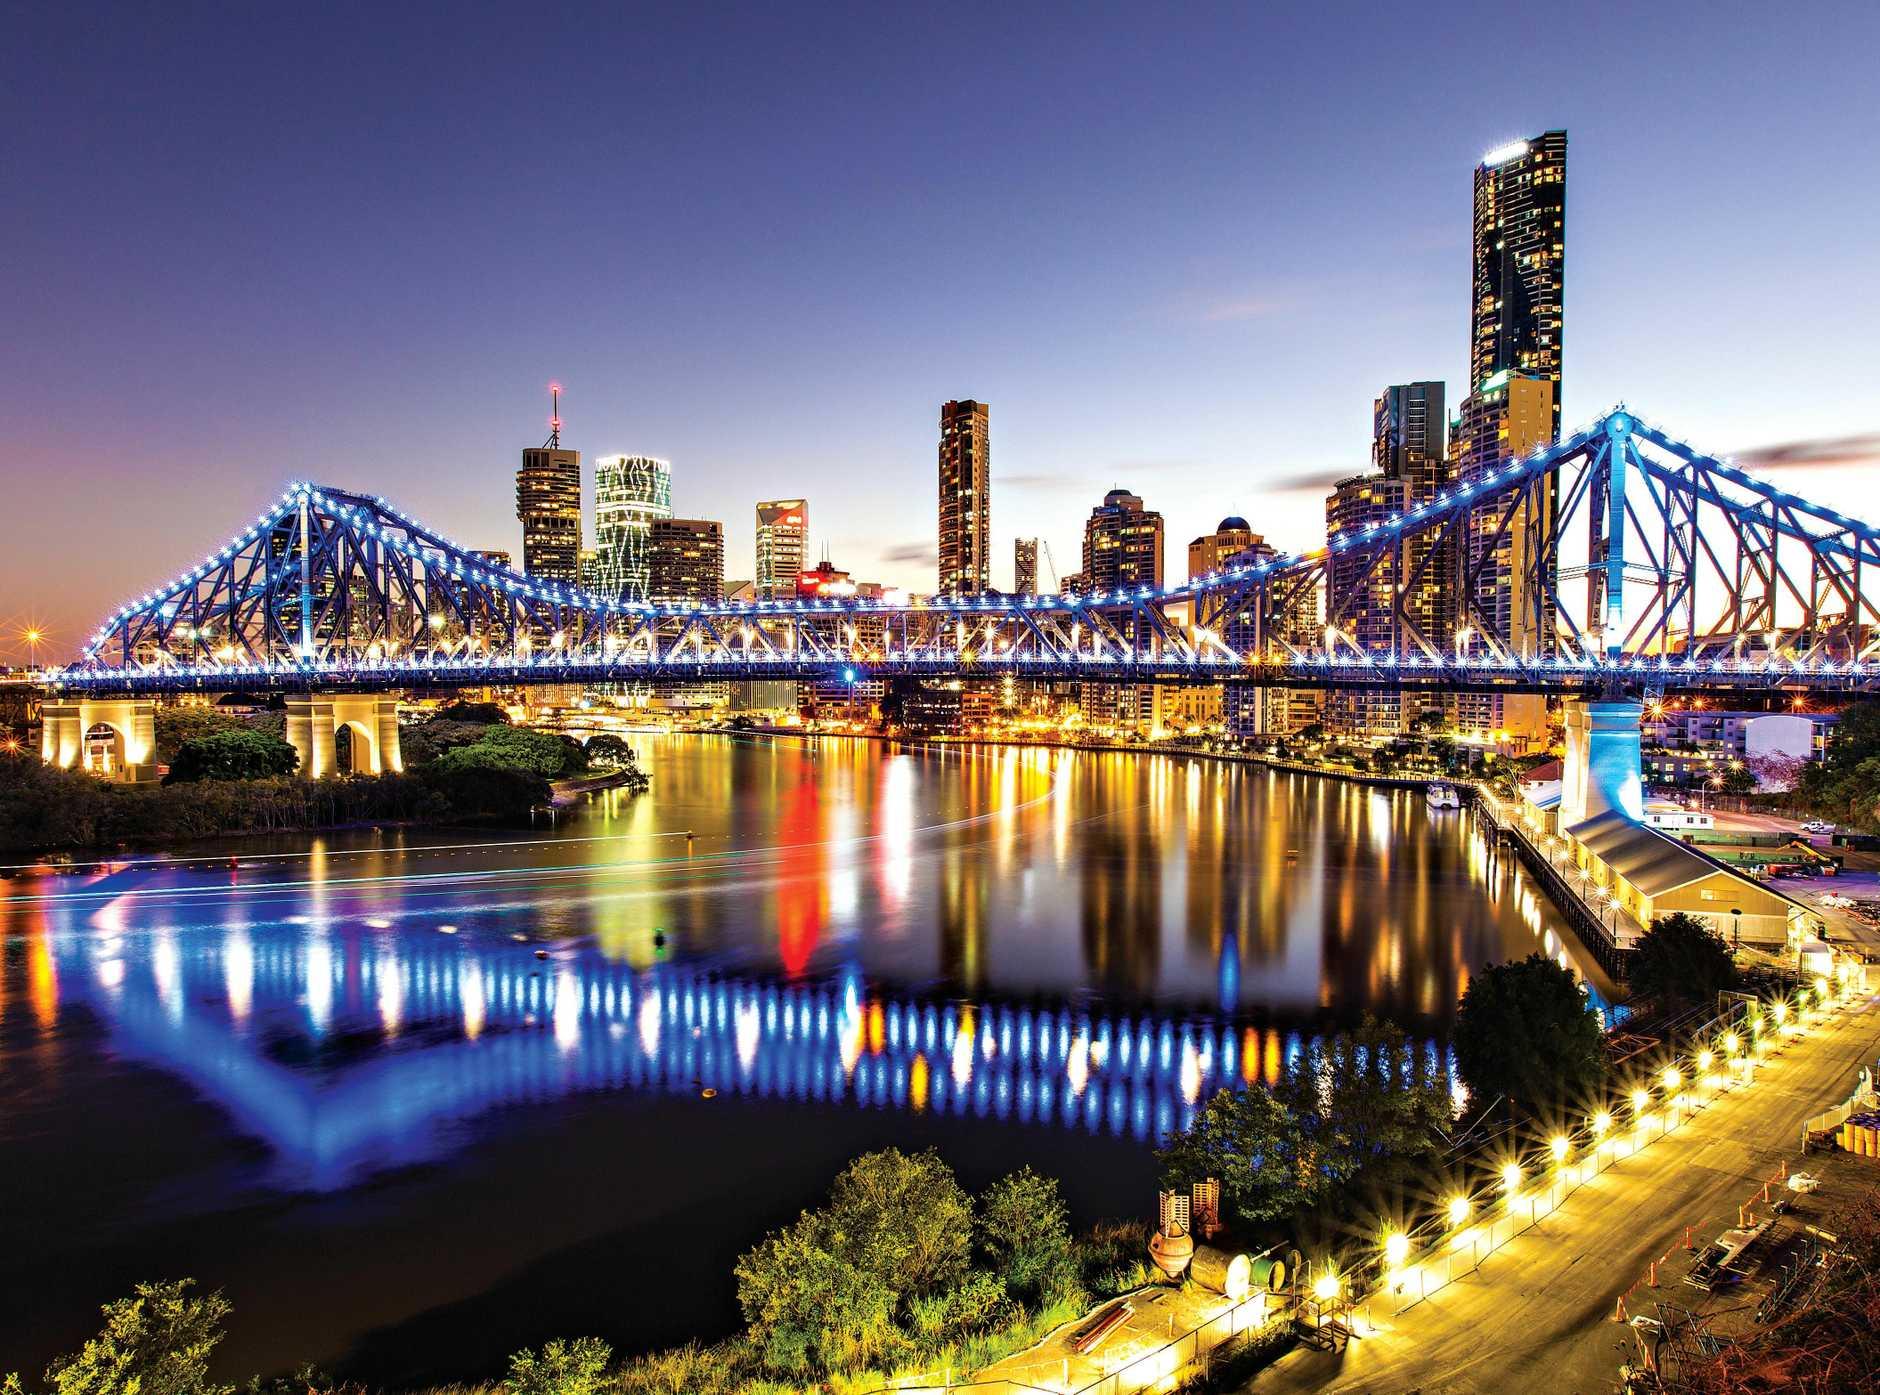 Brisbane's Iconic Story Bridge